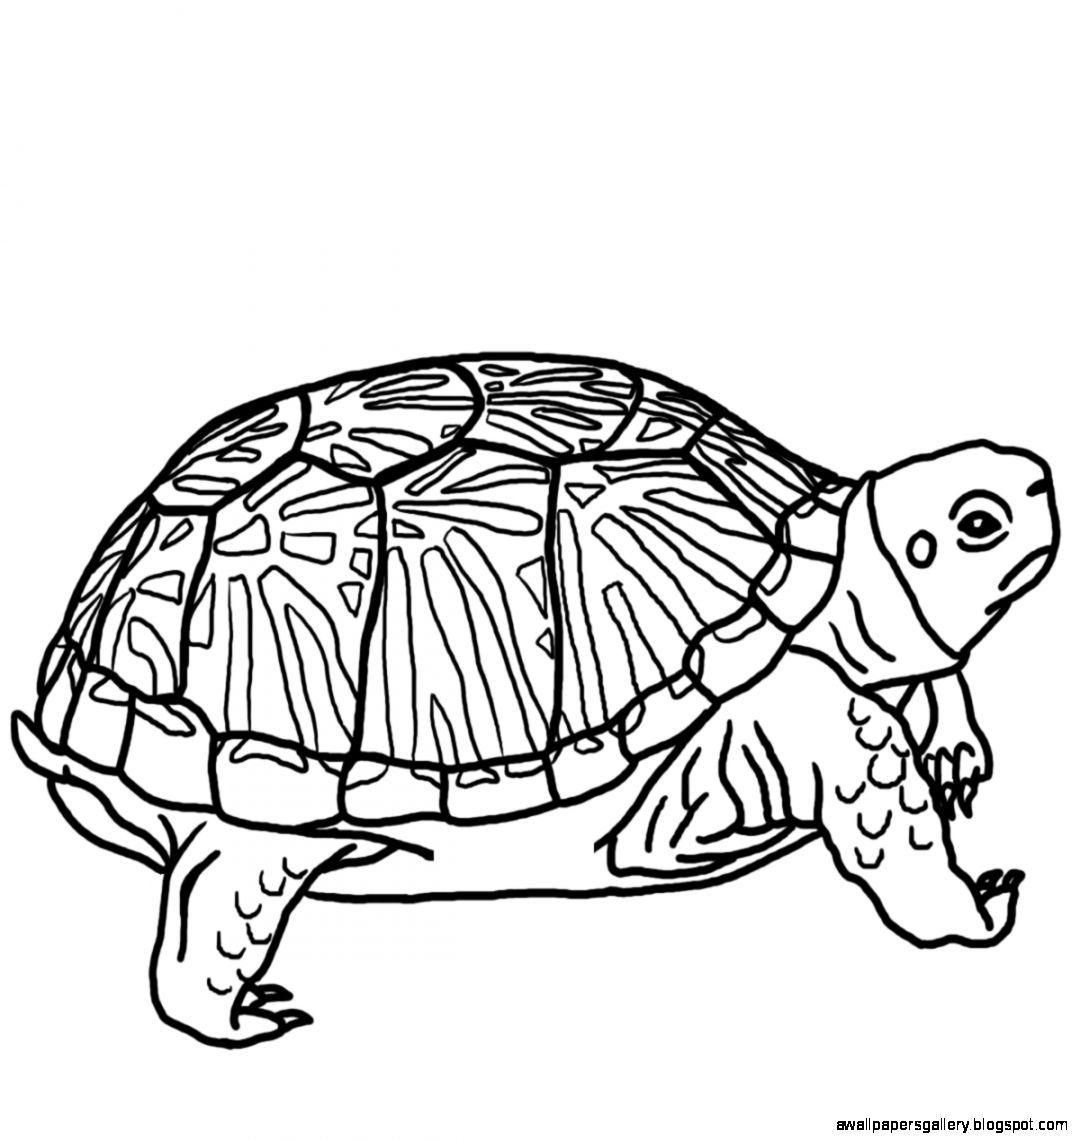 1080x1140 Turtle Drawing Free Download